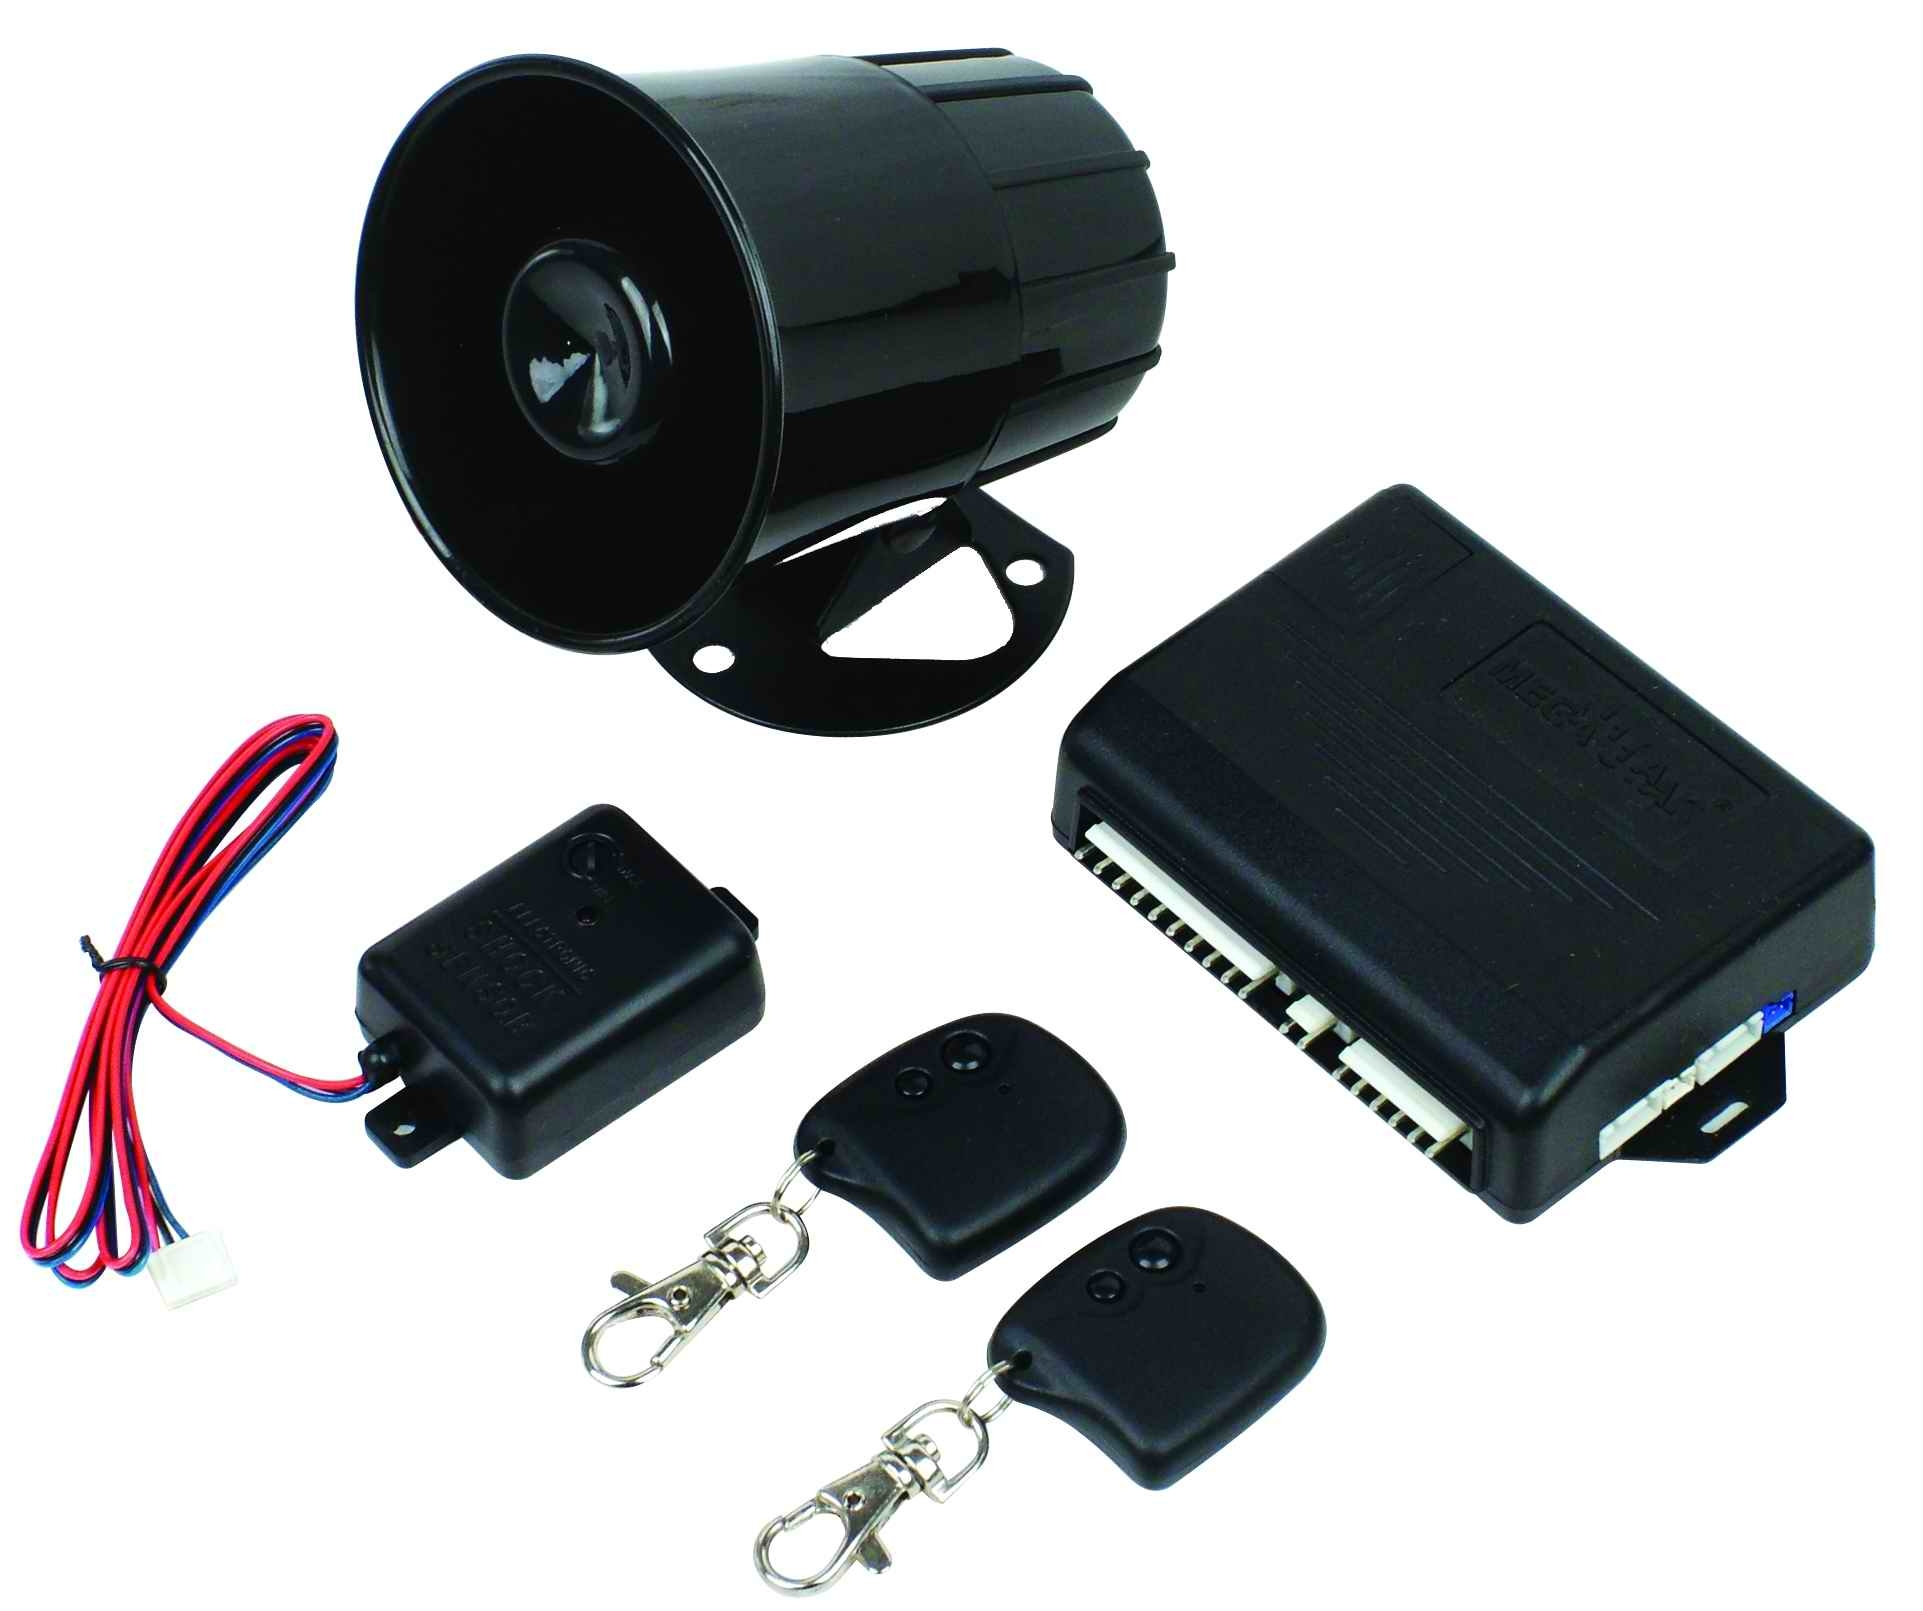 Car Alarm System (SD-4182)